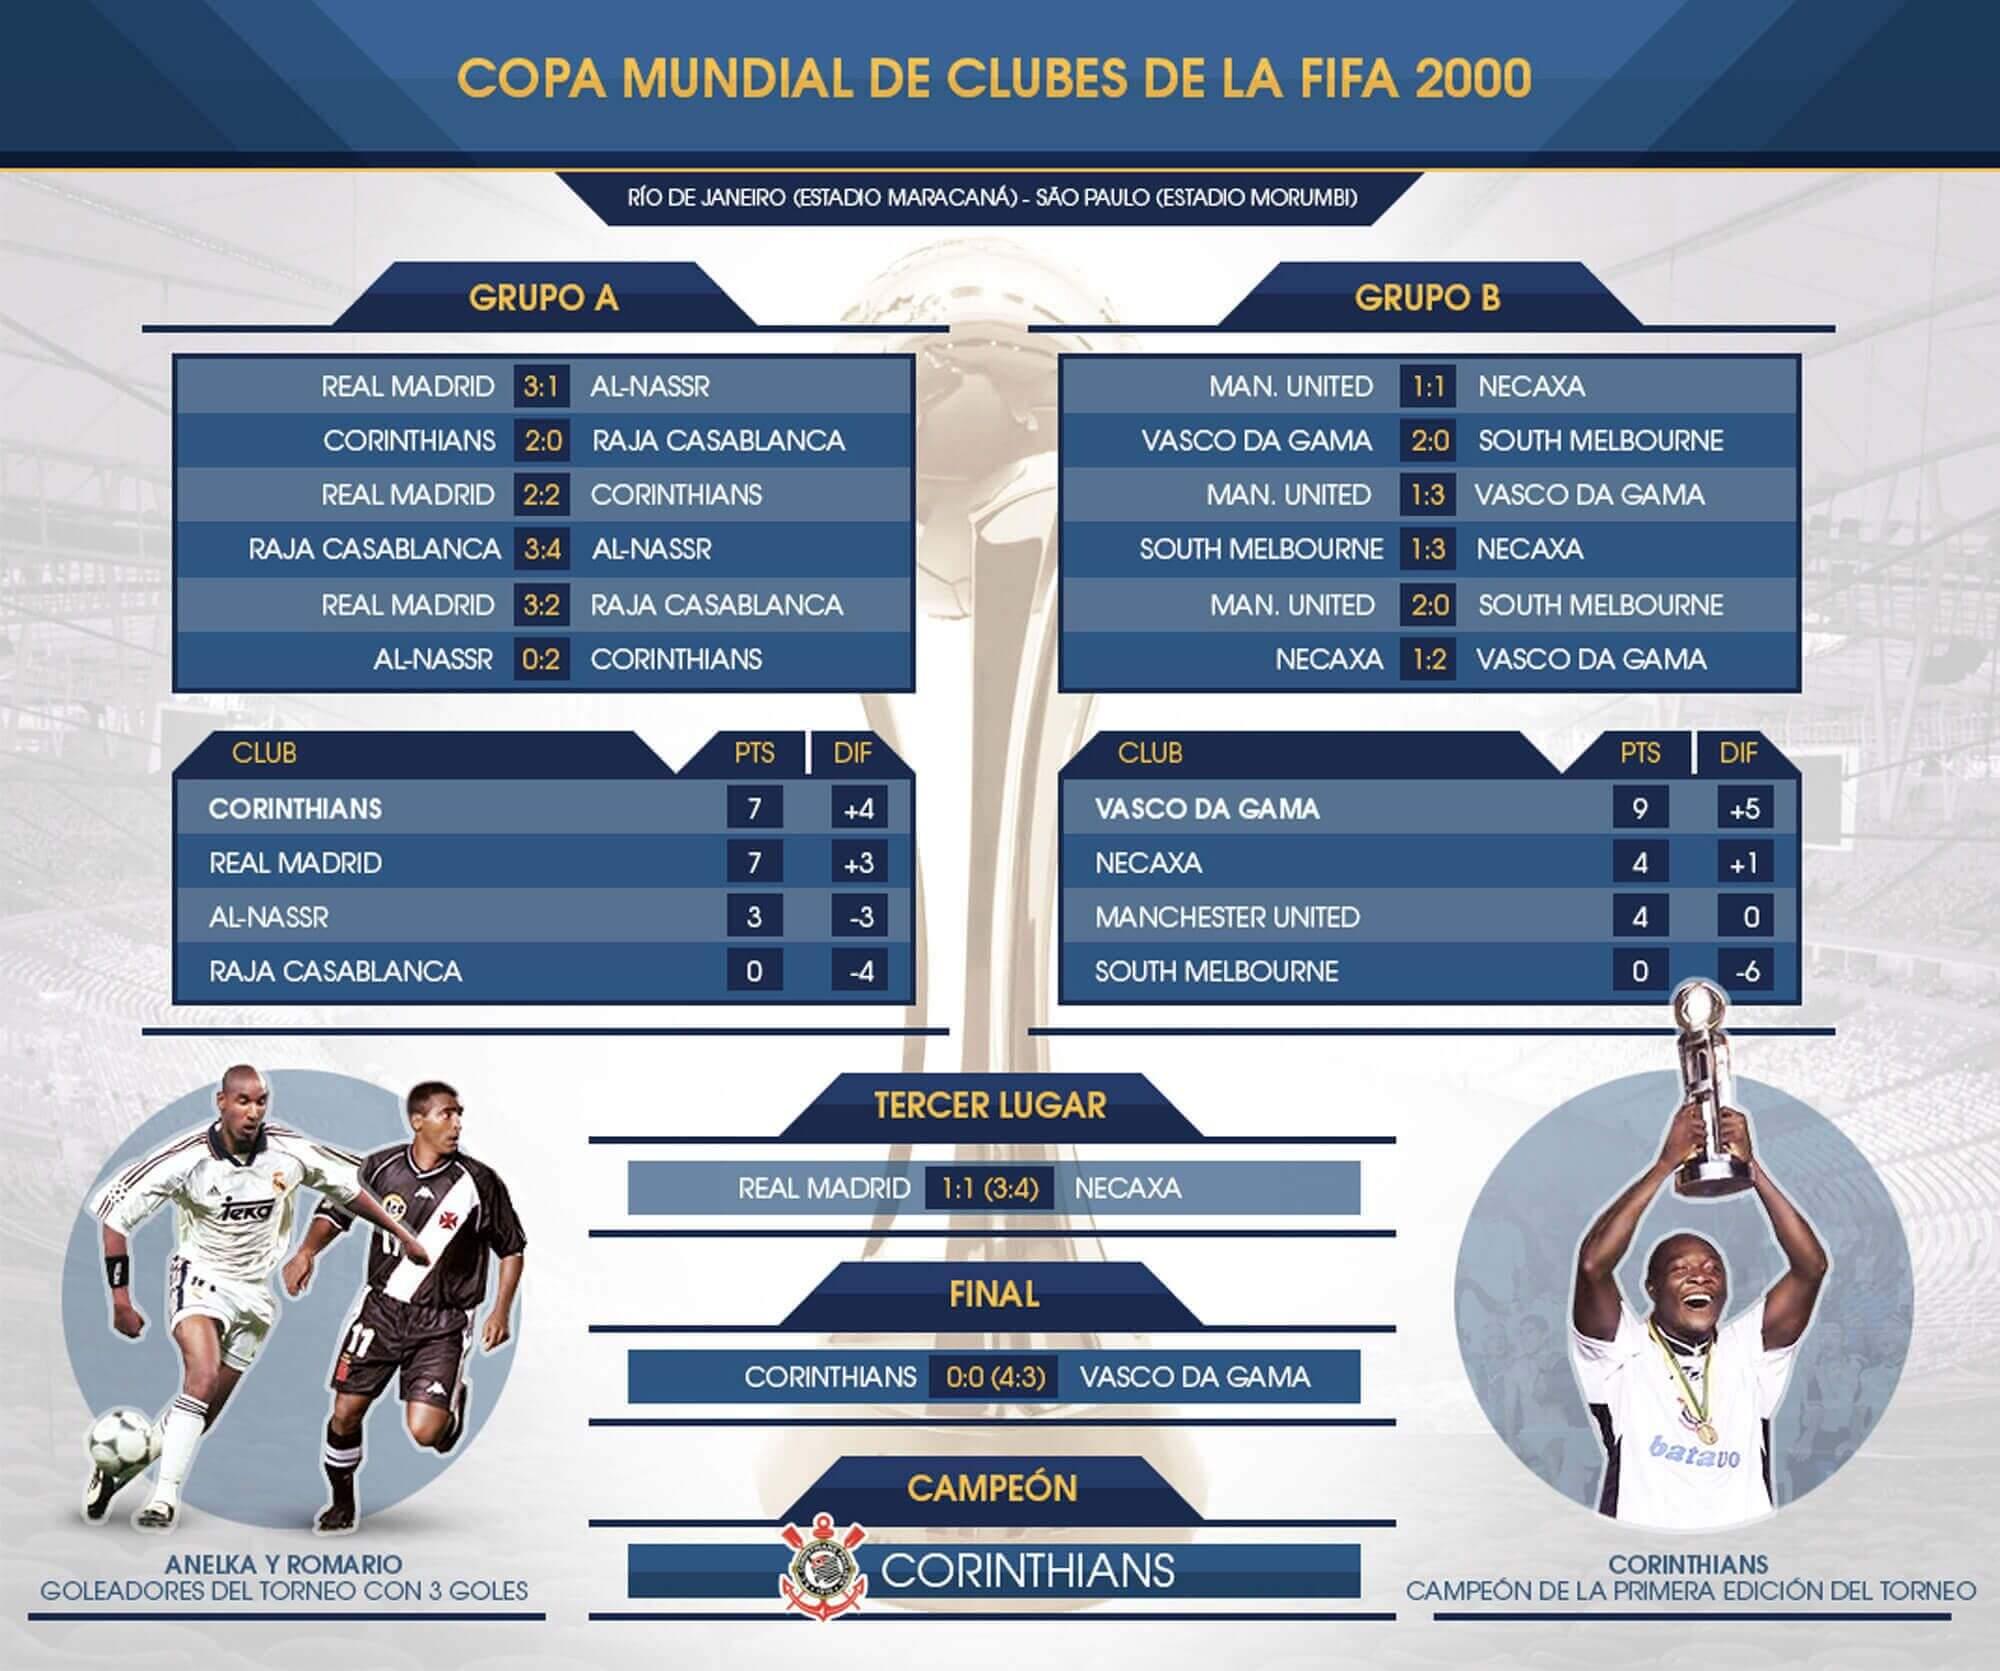 corinthians campeon mundial clubes 2000